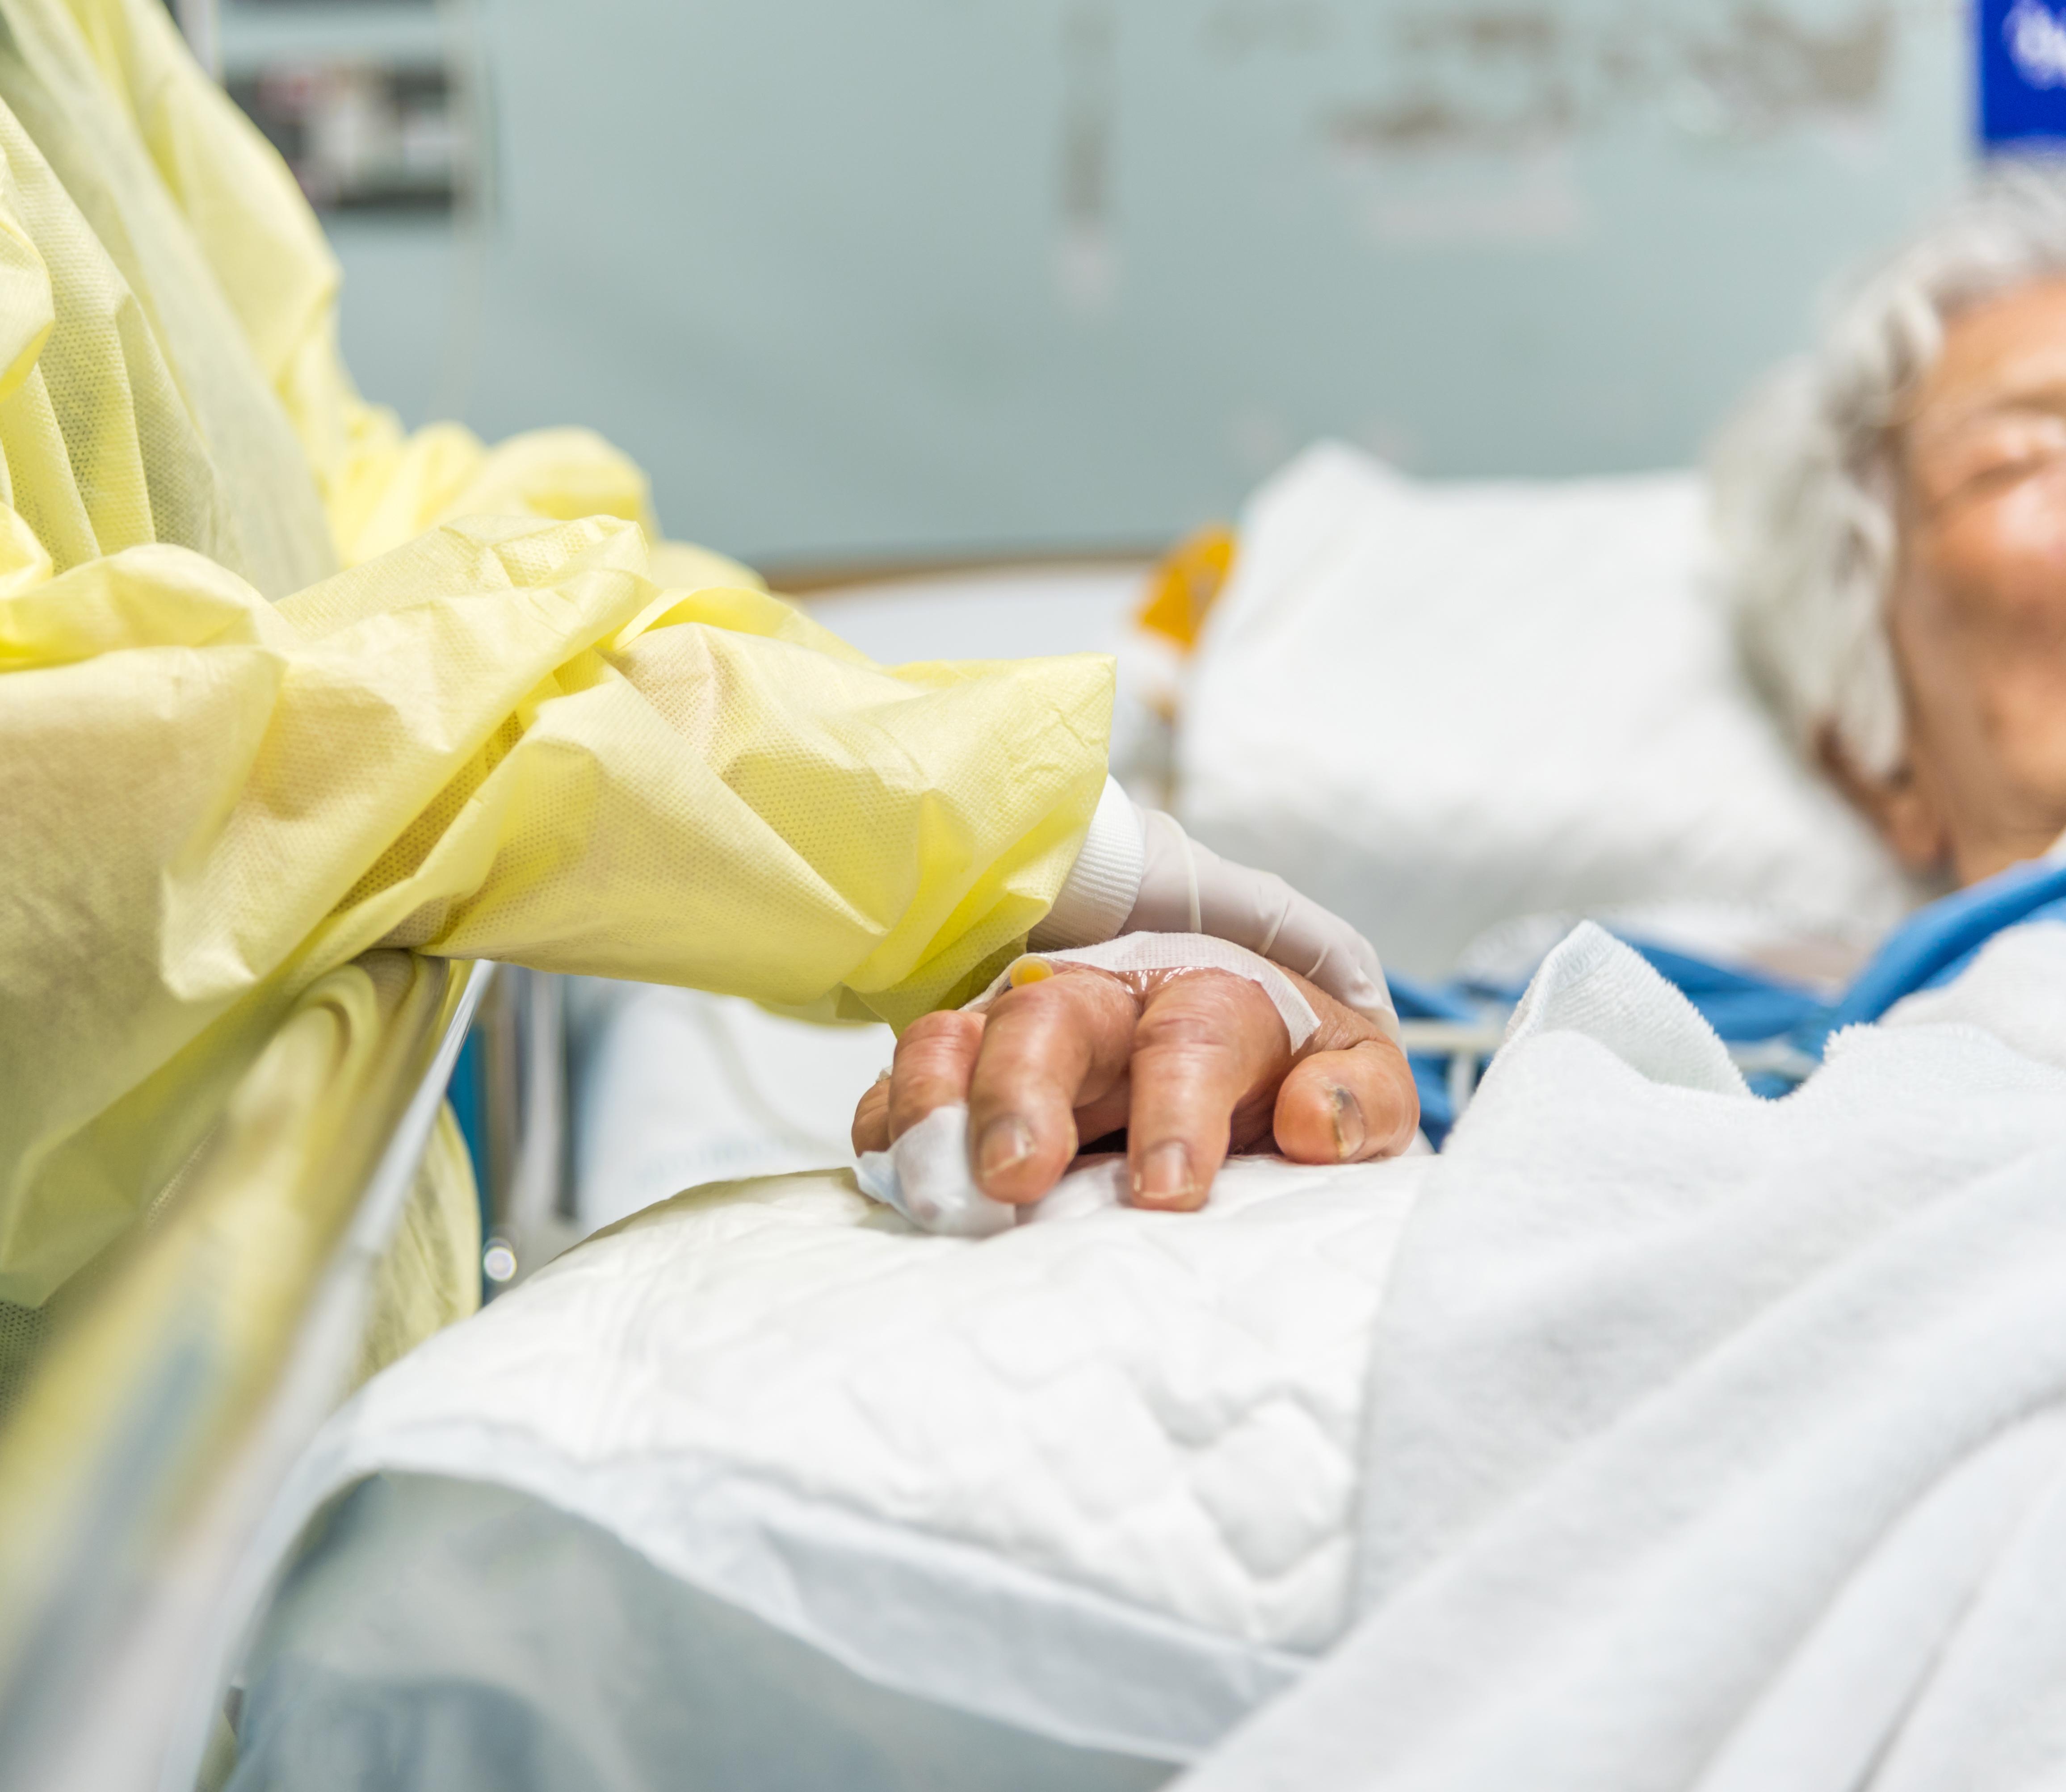 Fisioterapia adota posicionamentos funcionais aliado ao tratamento de COVID-19